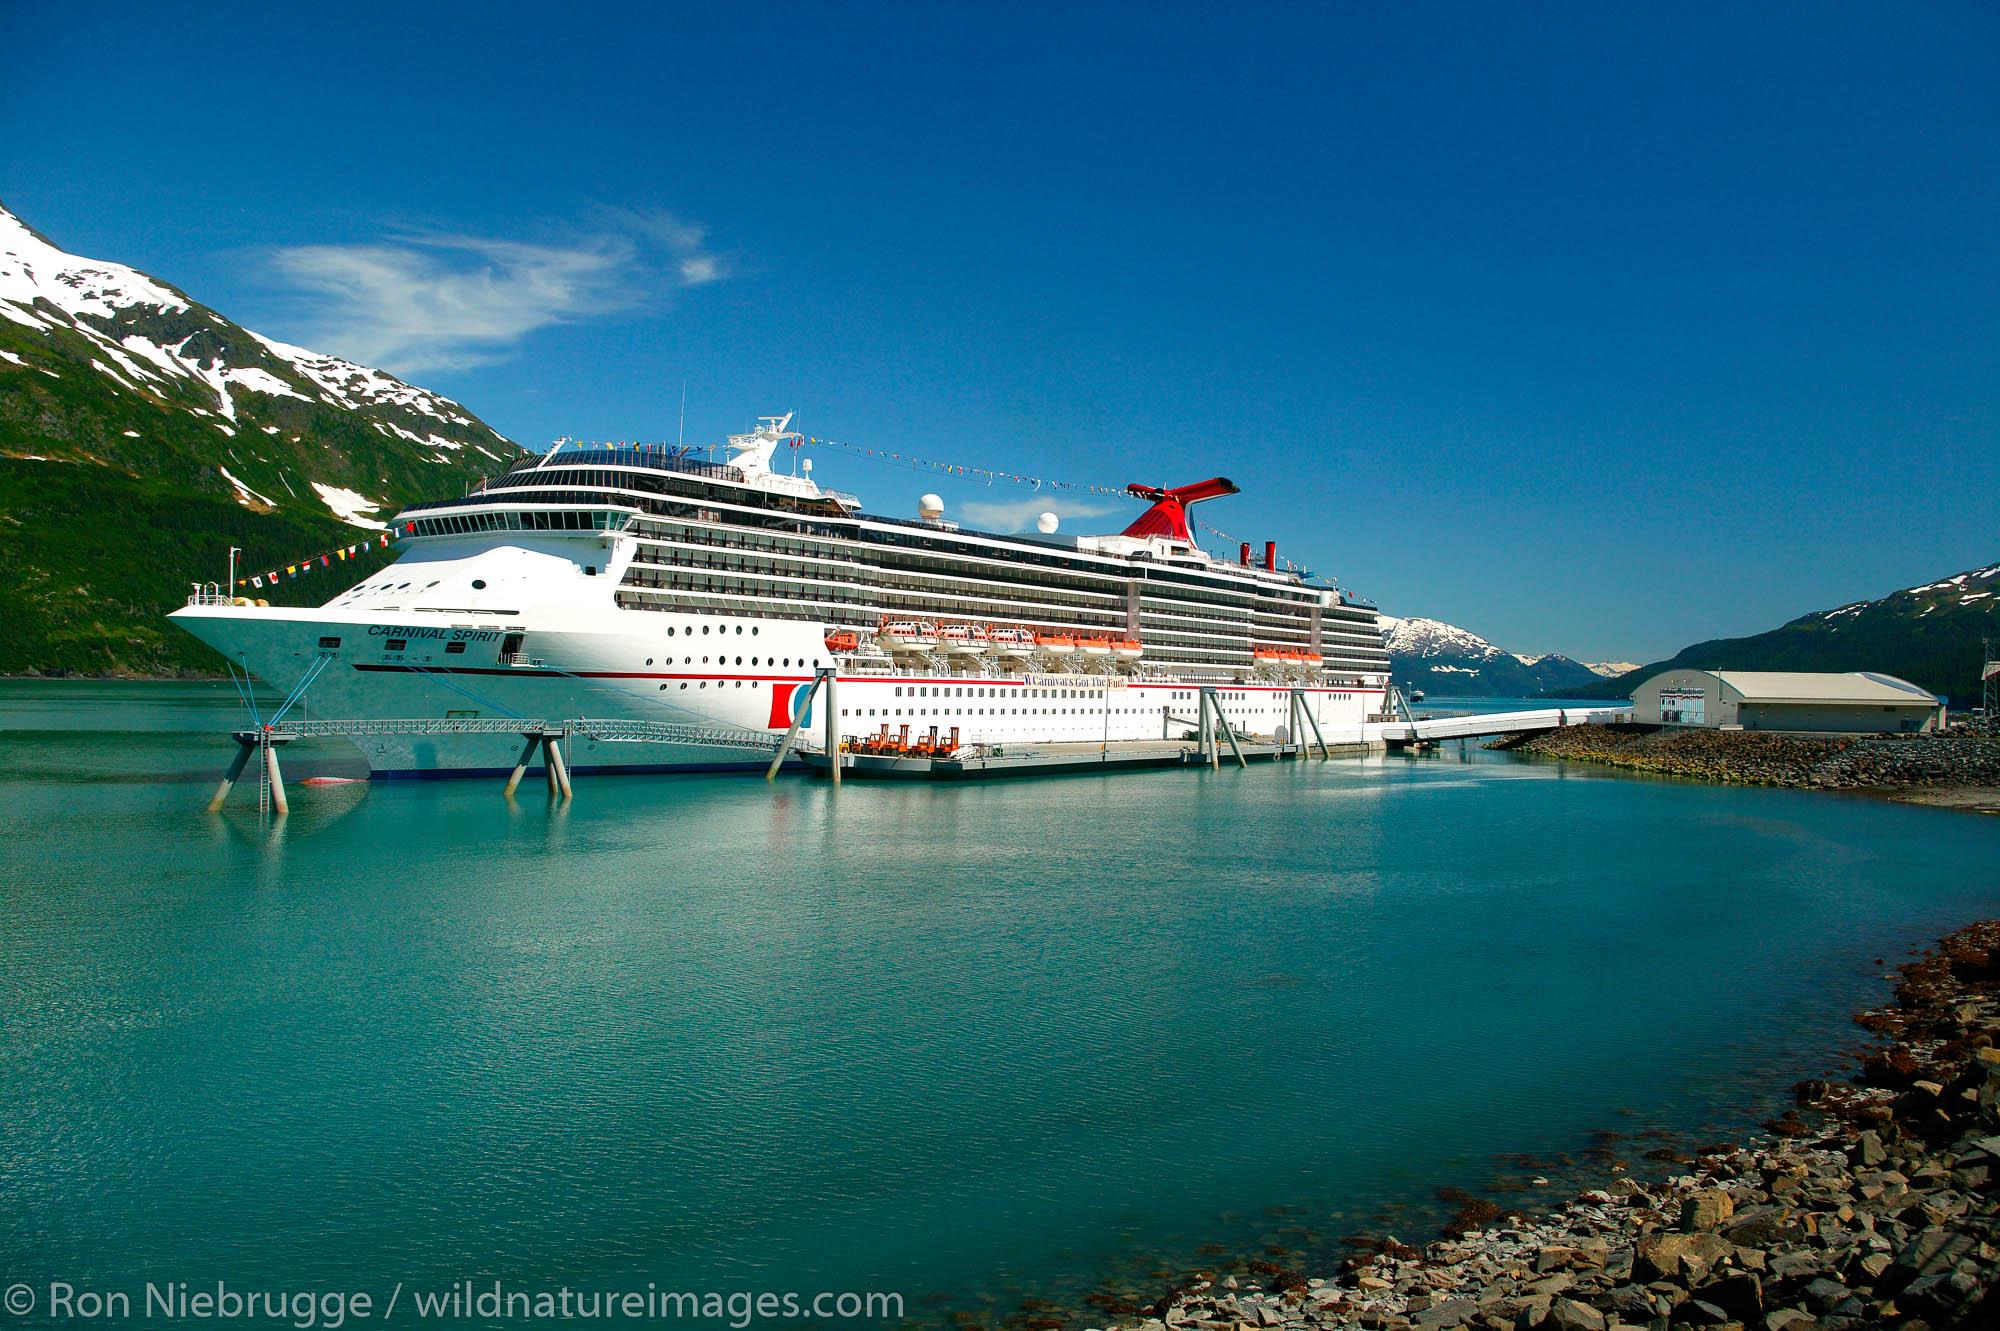 The Carnival Spirit cruiseship at the new (2004) cruiseship terminal in Whittier, Alaska.